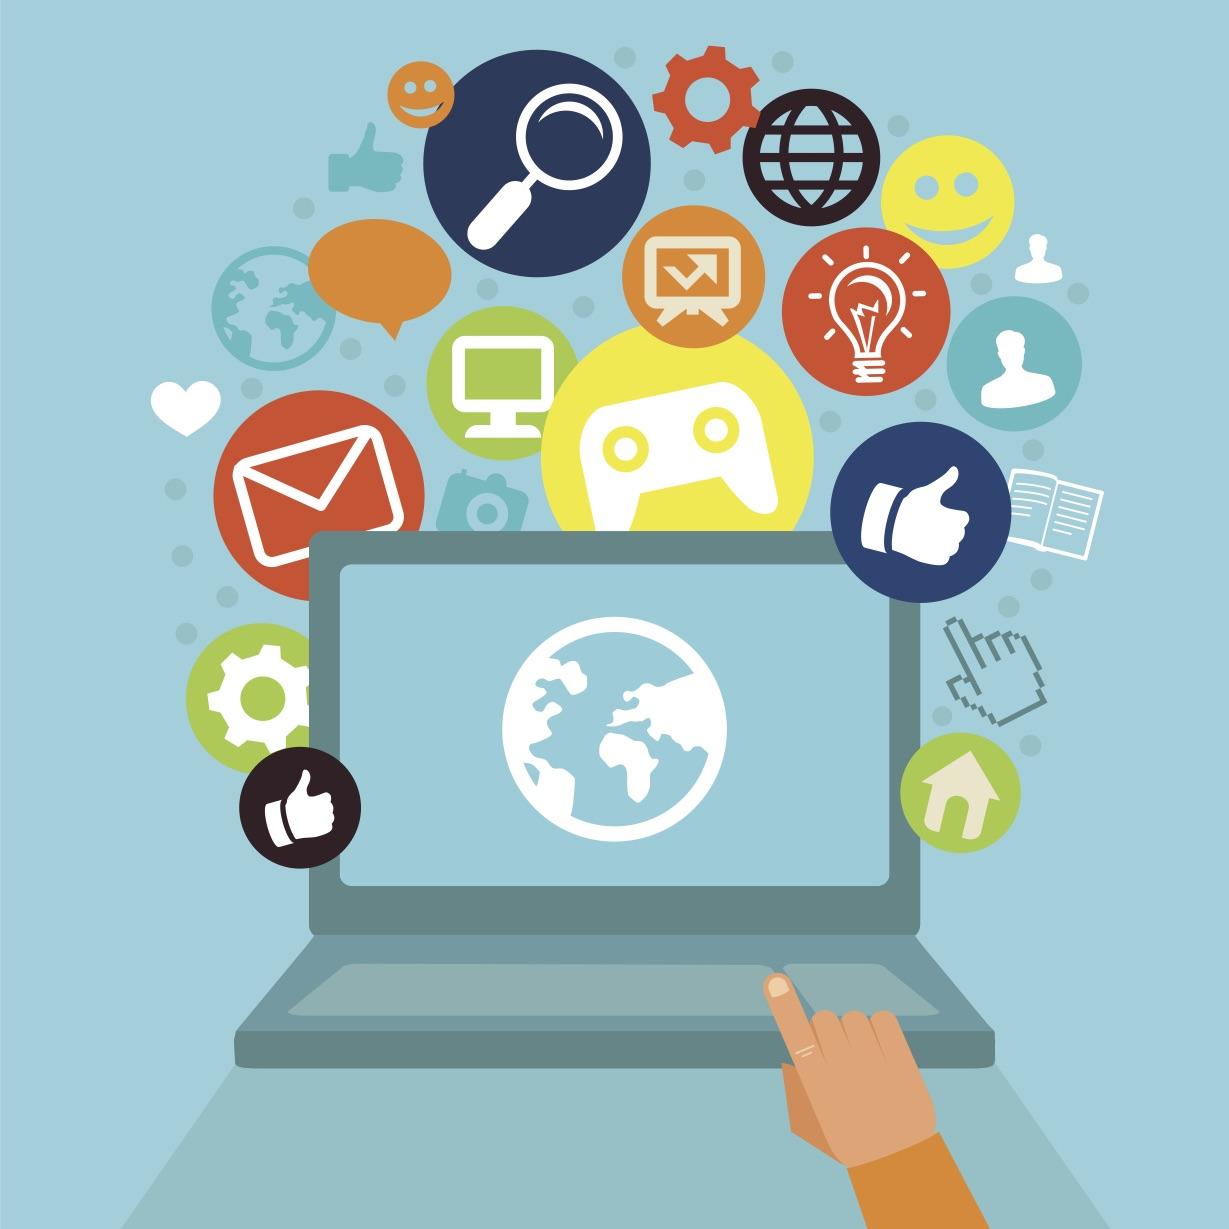 5 Reasons For SME's To Go Digital